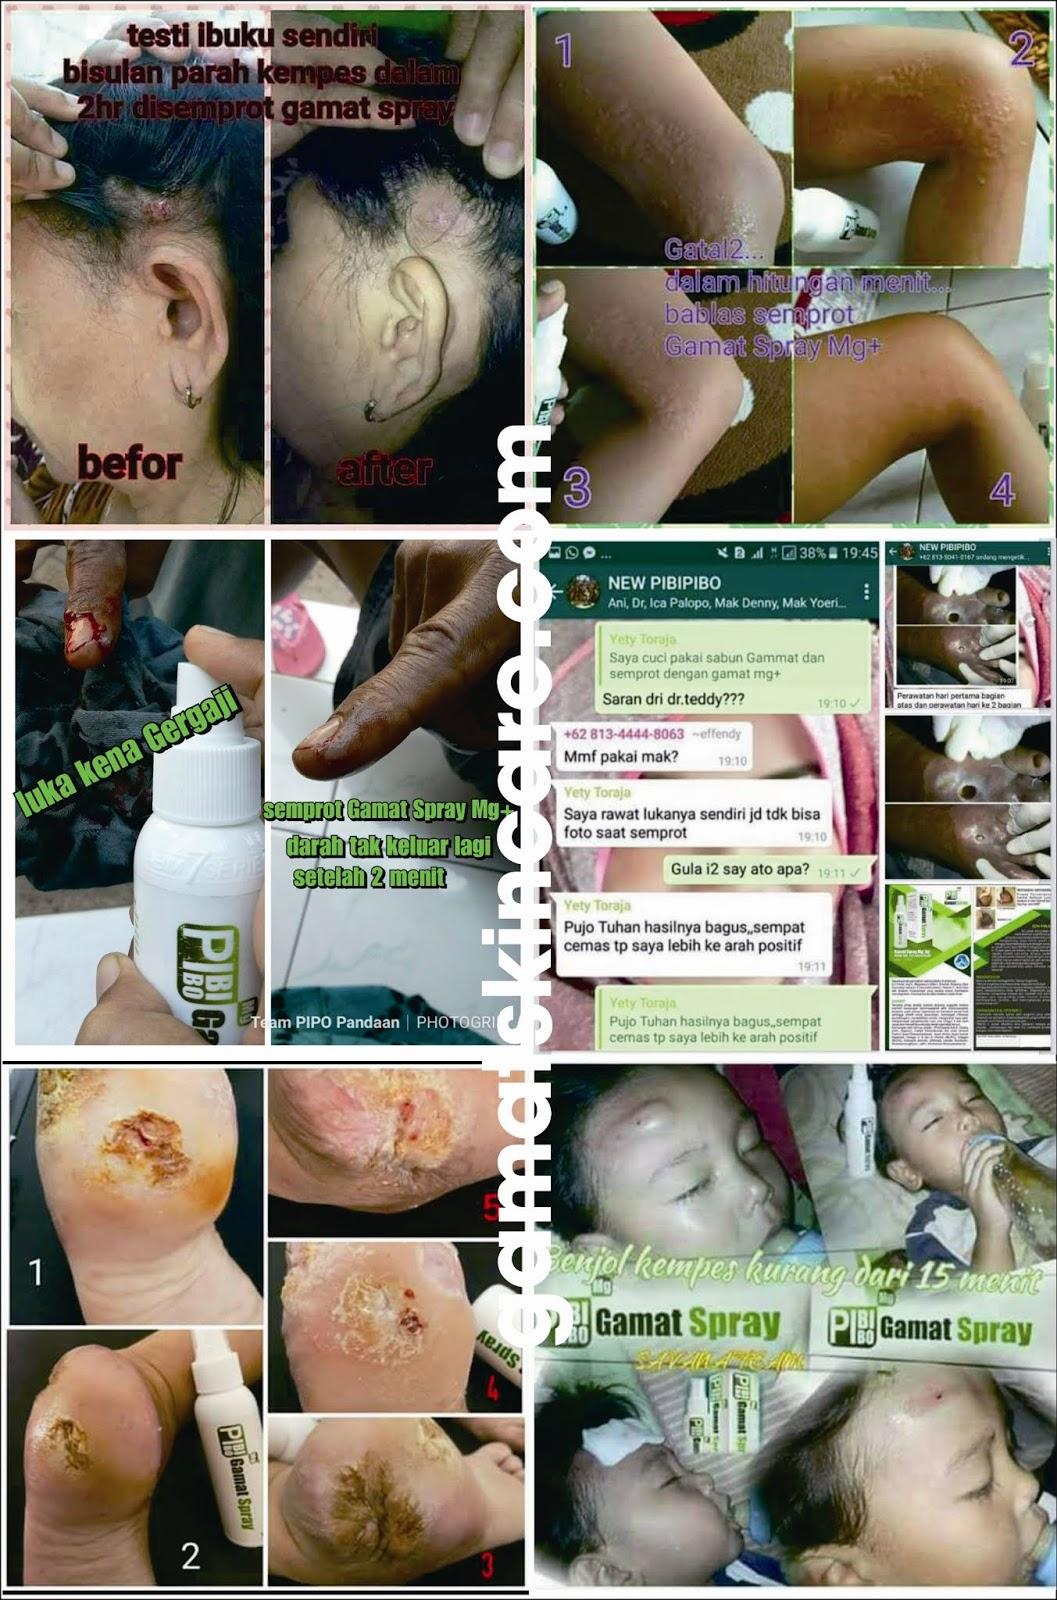 PibiPibo Gamat Spray Mg+ Ag+, PibiPibo Gamat Cream, PibiPibo Gamat Serum, PibiPibo Gamat Body Lotion, PibiPibo Gamat Facial Wash, PibiPibo Skin Cleanser, pibipibo, pibipibo sabun collagen, pibipibo adalah, pibipibo gamat serum, pibipibo gamat spray manfaatnya, pibipibo produk, pibipibo sabun, pibipibo serum, pibipibo black soap, pibipibo green coffee, pibipibo facial wash, gamat, gamat emas, gamat hpai, gamat gold, gamat spray, gamat jelly, gamat emulsion, gamat emas kapsul, gamat kapsul, gamat pibipibo, gamat luxor, teripang emas, teripang emas laut, teripang emas kering, teripang emas msi, teripang emas wikipedia, teripang emas dan khasiatnya, teripang emas pdf, teripang emas qnc jelly gamat, teripang emas kapsul, teripang emas hpai, teripang emas klasifikasi,